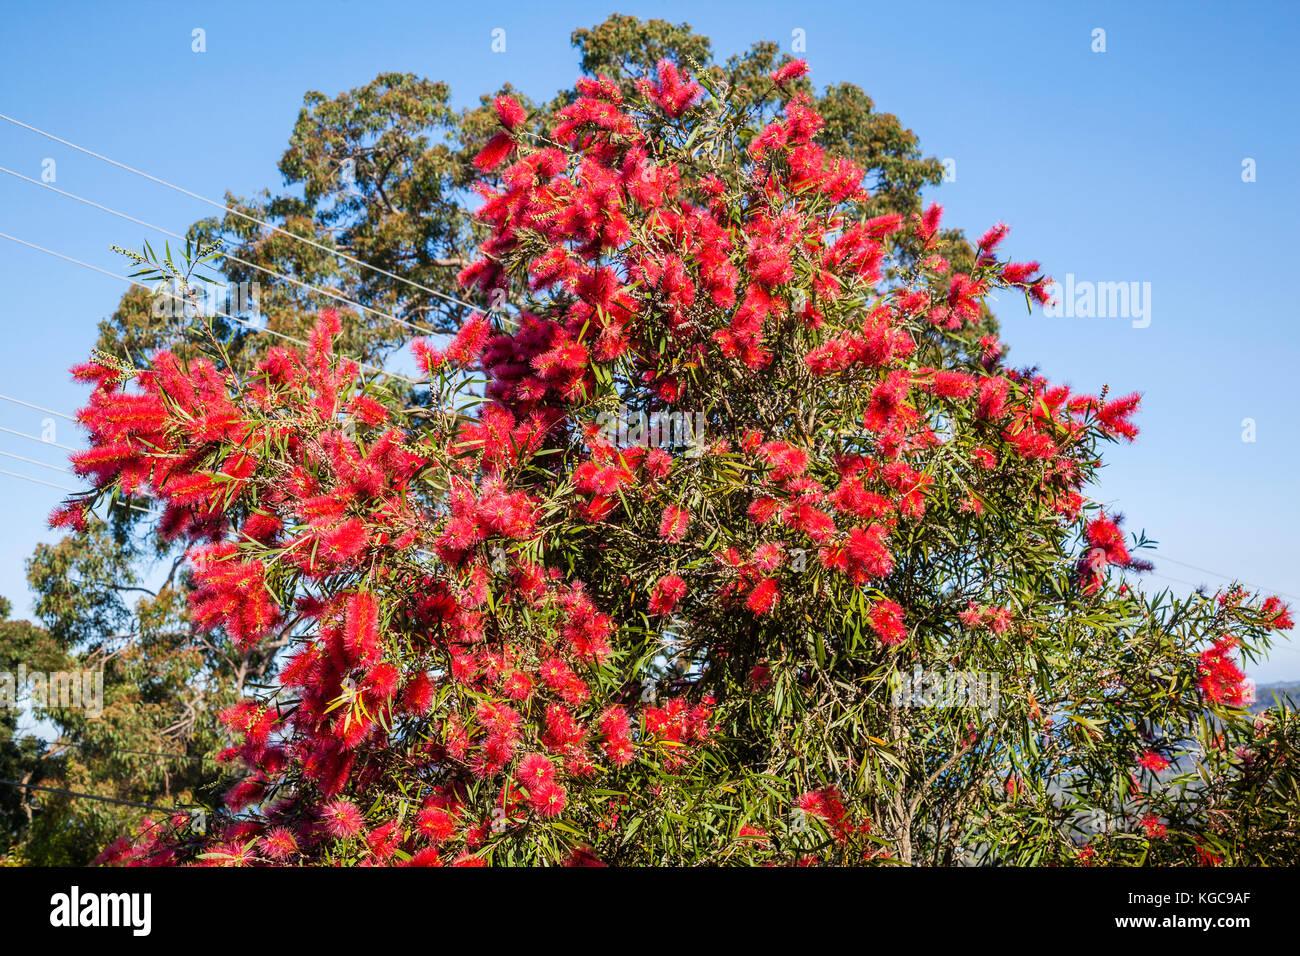 Australia, New South Wales, Central Coast, Red bottlebrush in full flower at Umina Beach - Stock Image